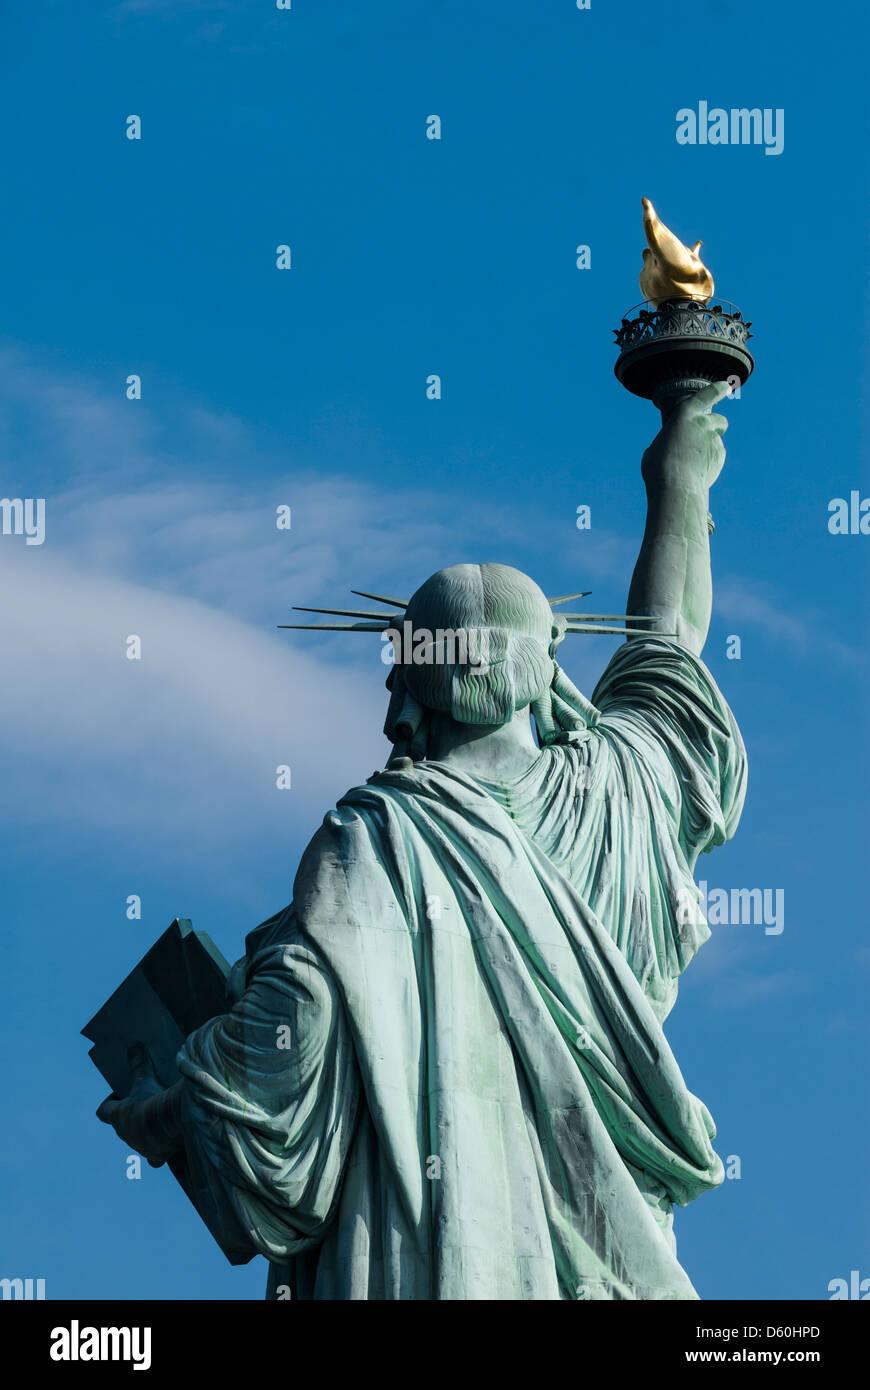 Rückseite der Statue of Liberty, Liberty Island, New York City, New York, Vereinigte Staaten von Amerika, USA Stockbild